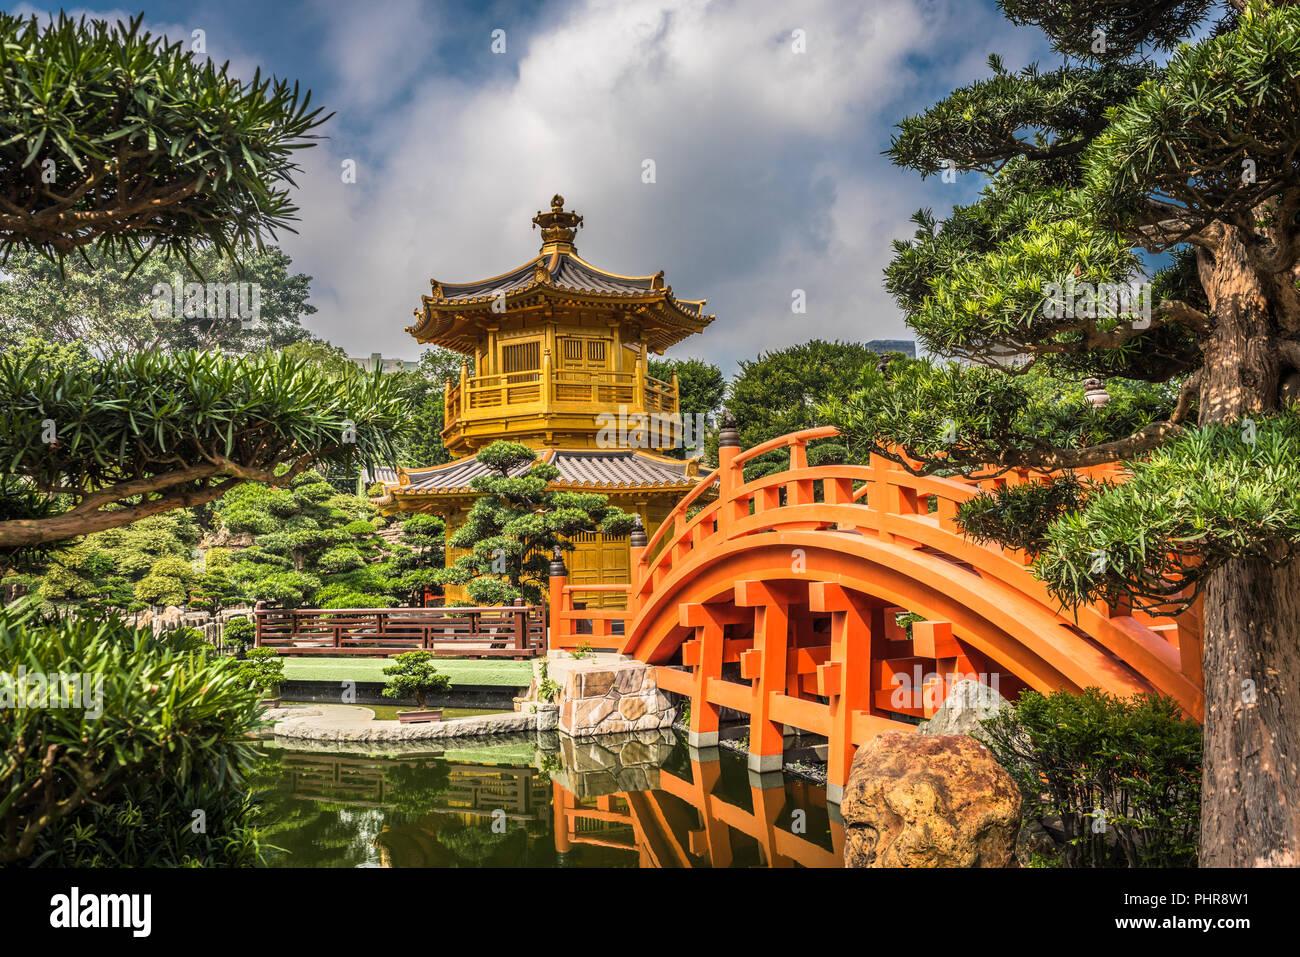 The golden pavilion in Nan Lian Garden, Hong Kong. Stock Photo